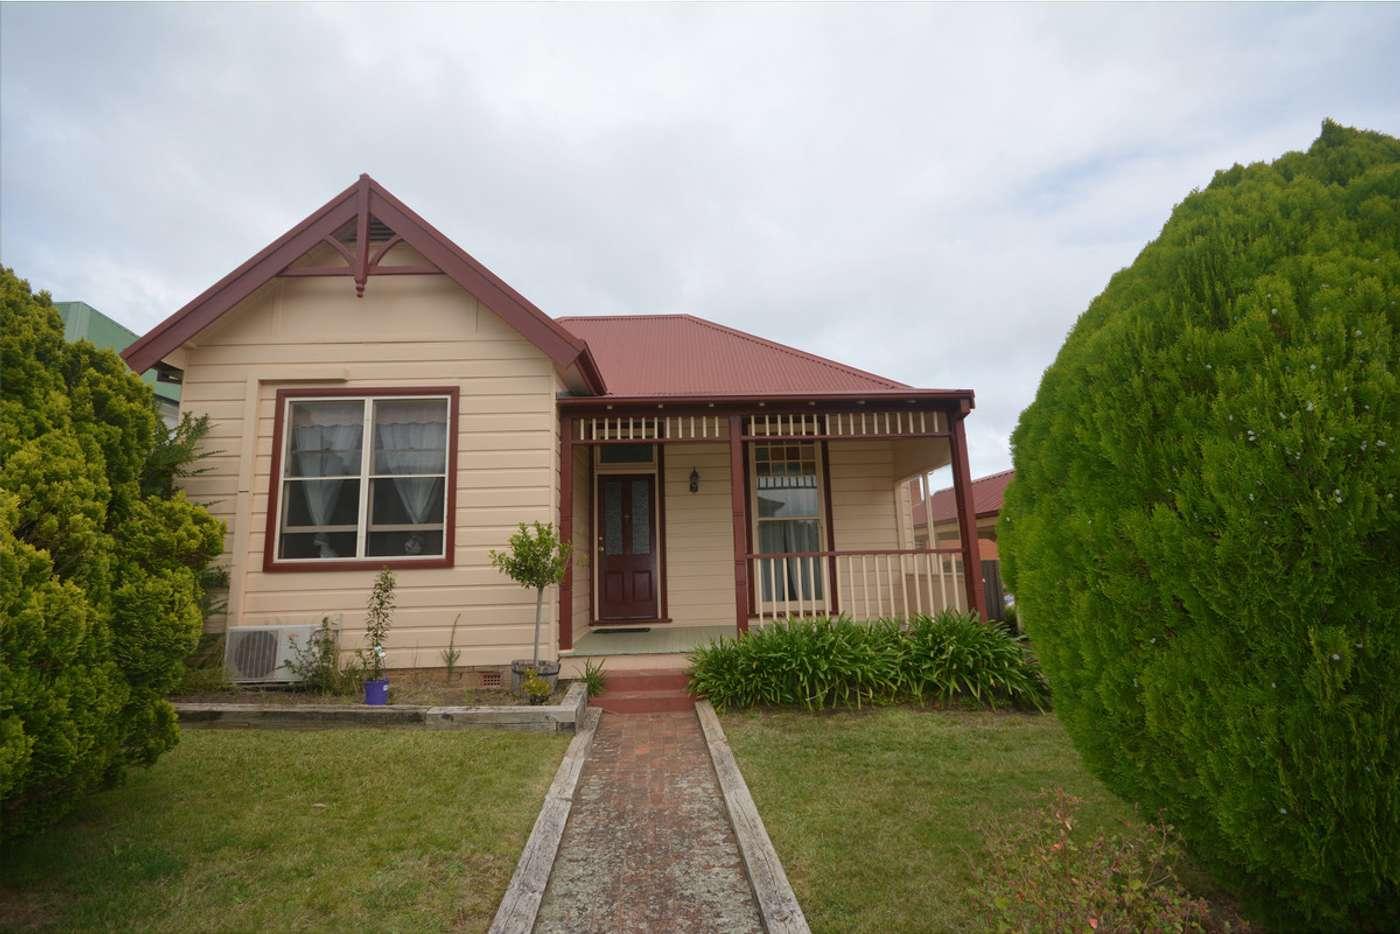 Main view of Homely house listing, 1/7-11 Merriwa Street, Katoomba NSW 2780